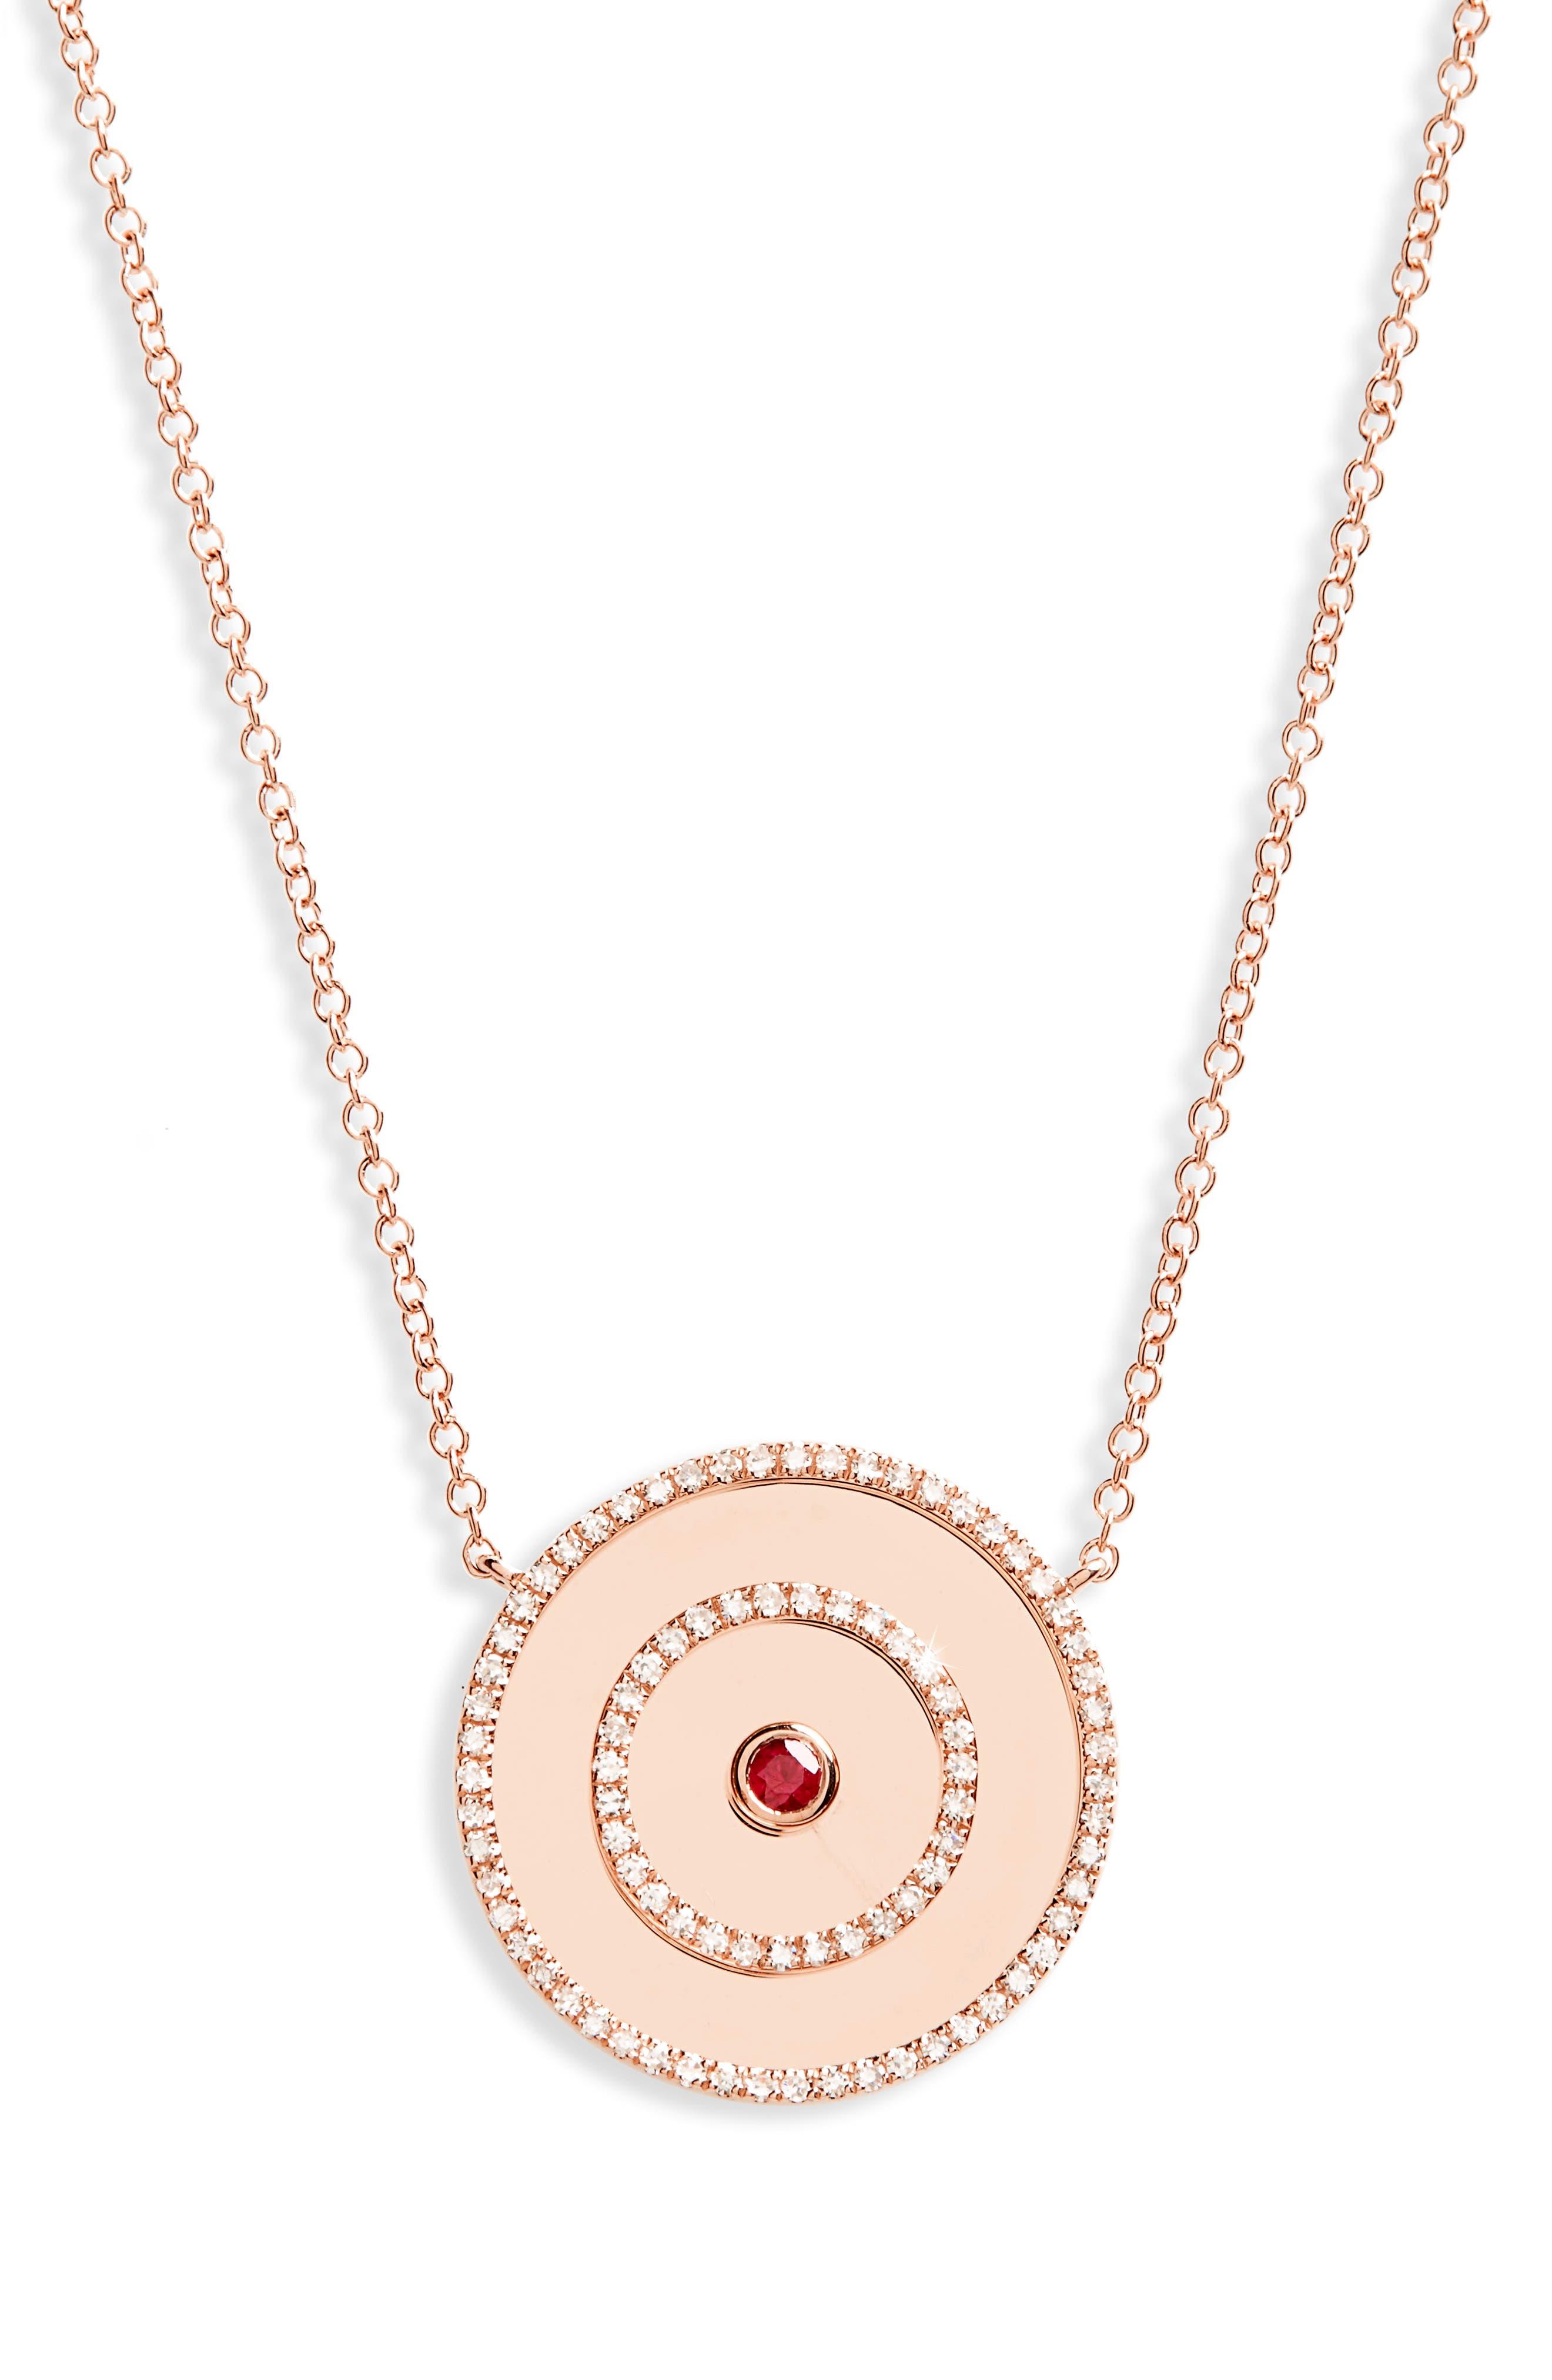 Main Image - EF COLLECTION Bullseye Diamond Pendant Necklace